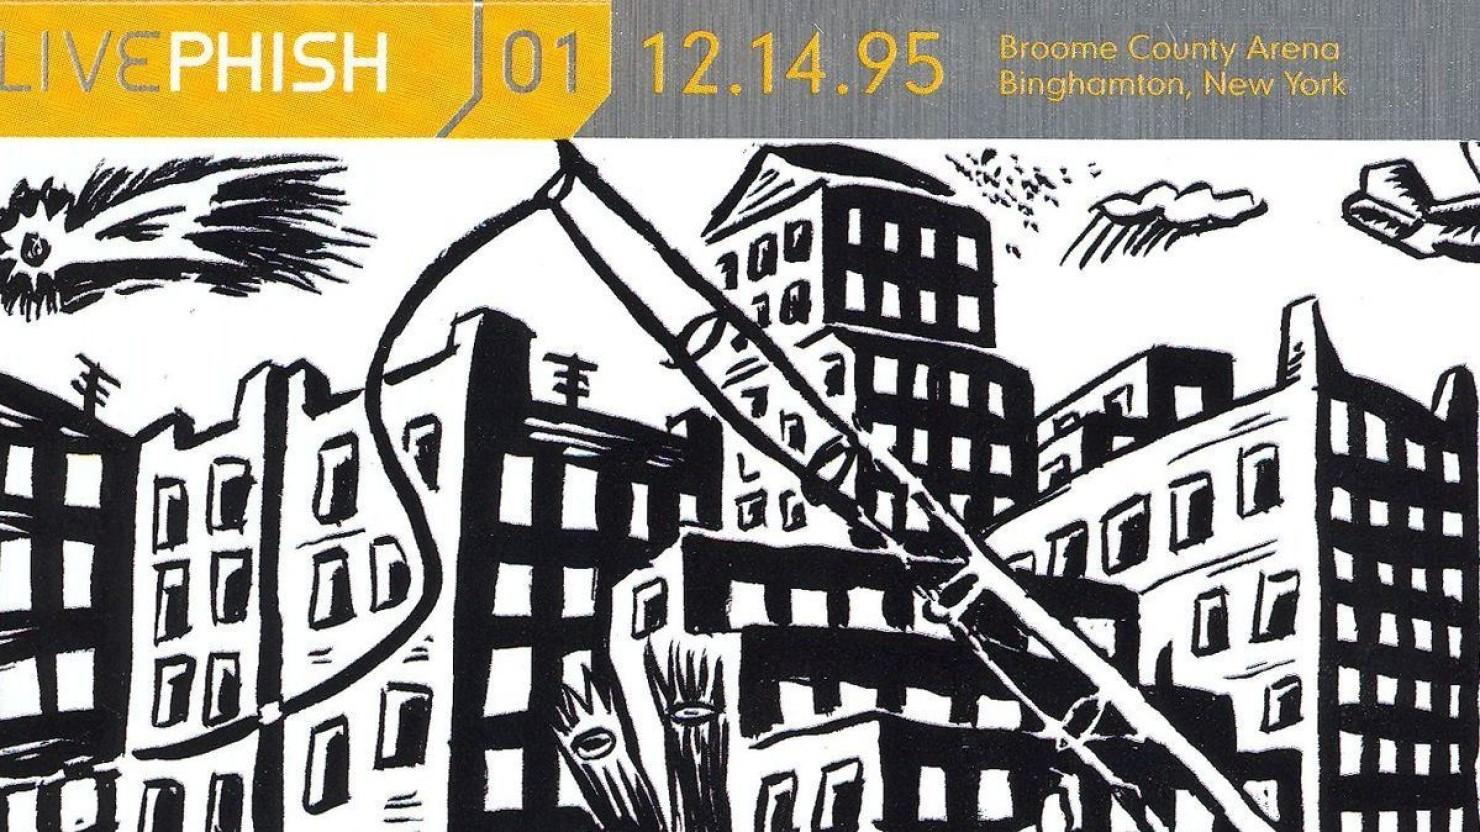 Phish - Livephish 07.29.03 Post-Gazette Pavilion at Star Lake Burgettstown PA